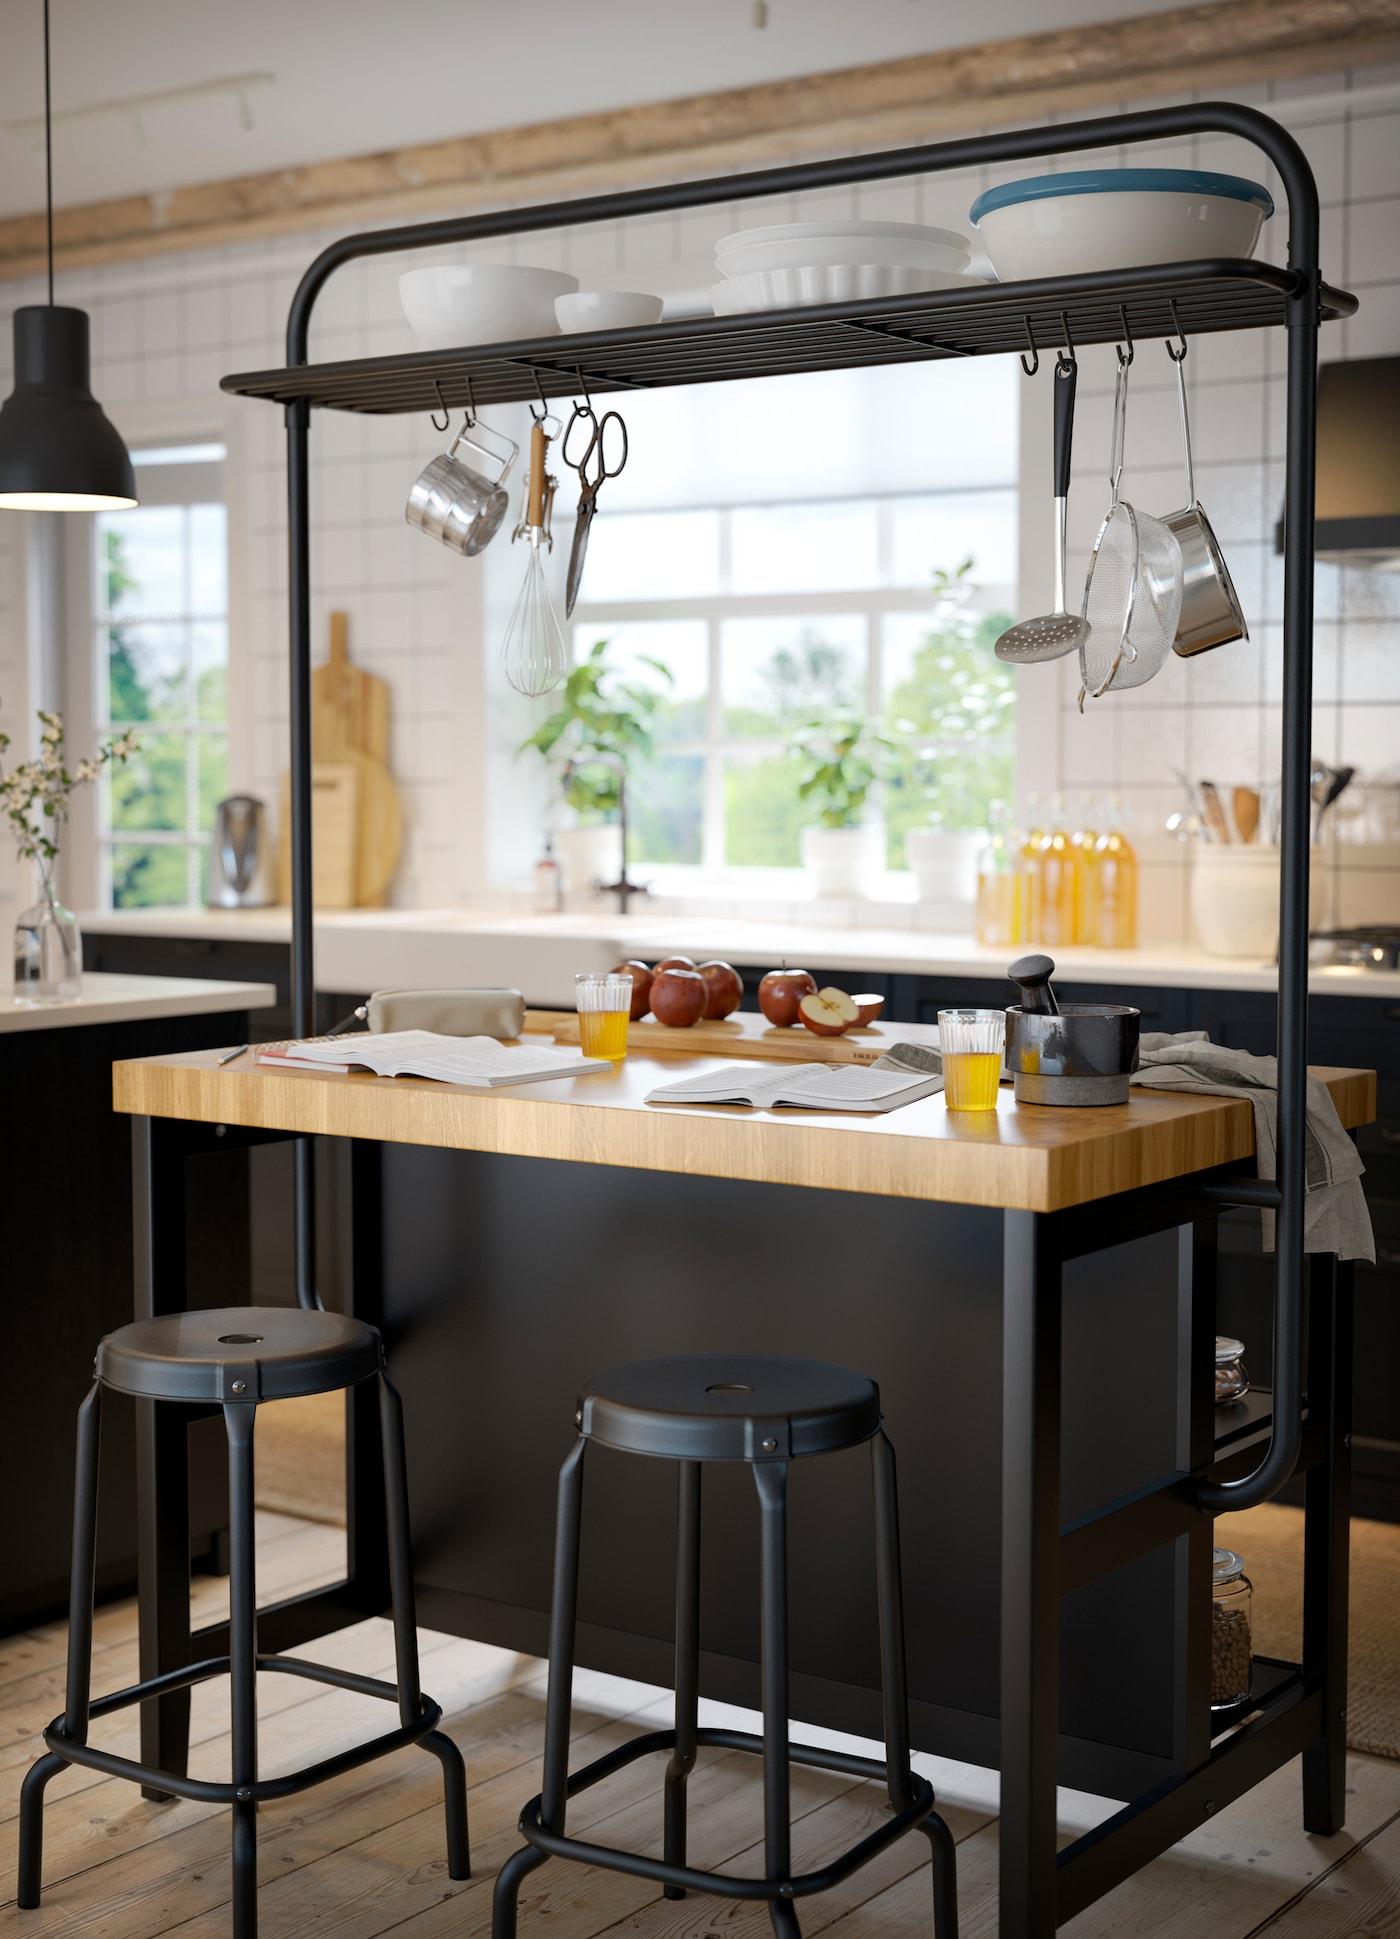 sillas para isla de cocina ikea